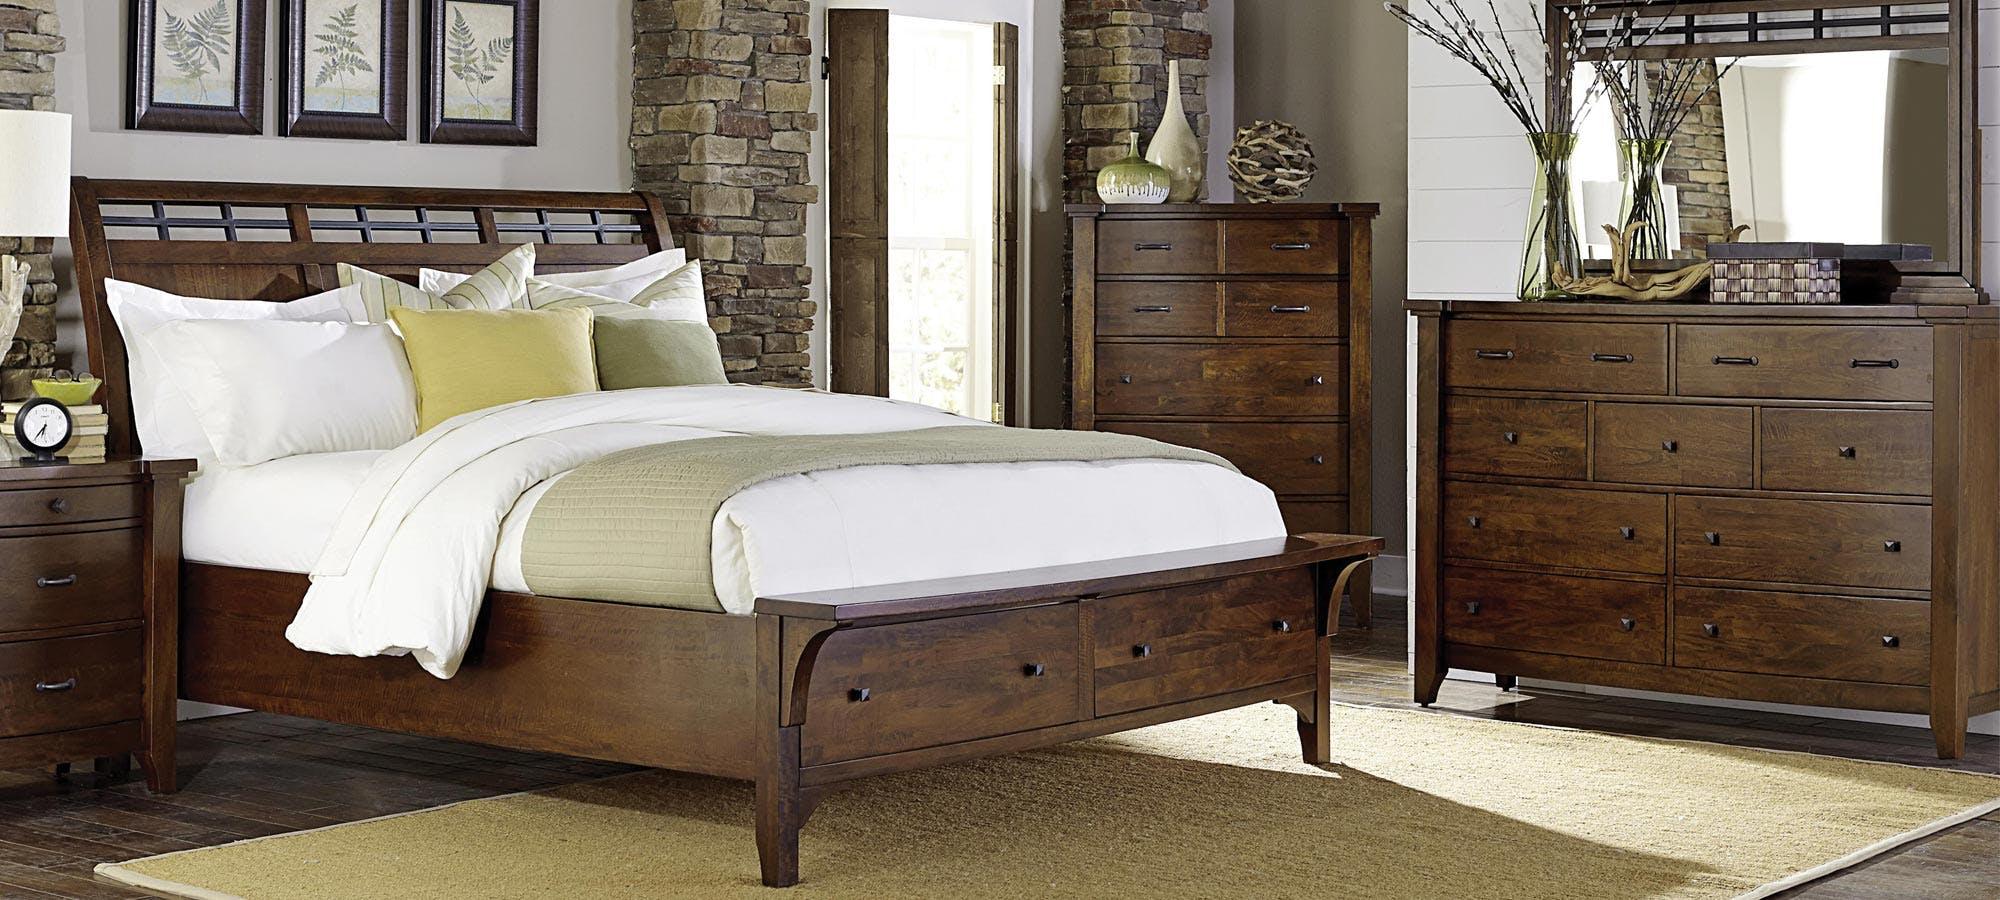 Local Bedroom Furniture Stores Cincinnati Furniture Dayton Furniture Furniture Fair